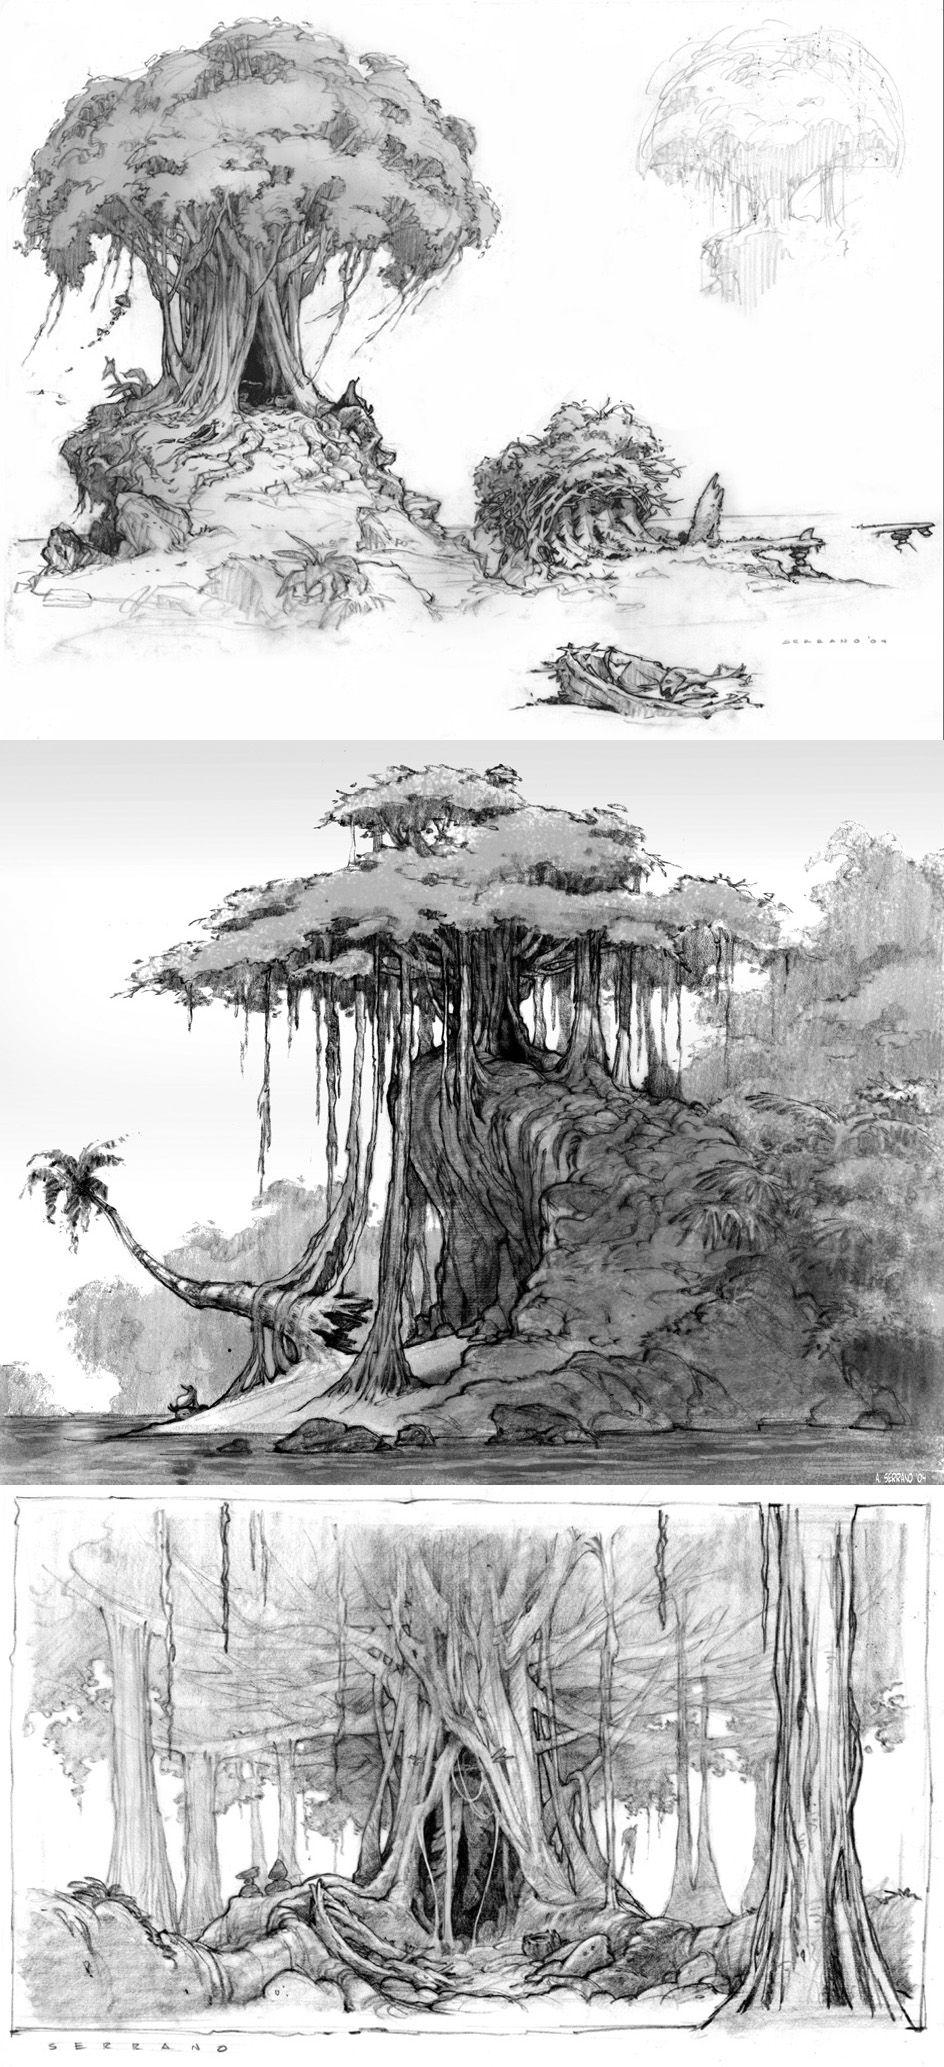 Tree drawings drawing trees nature drawing pencil